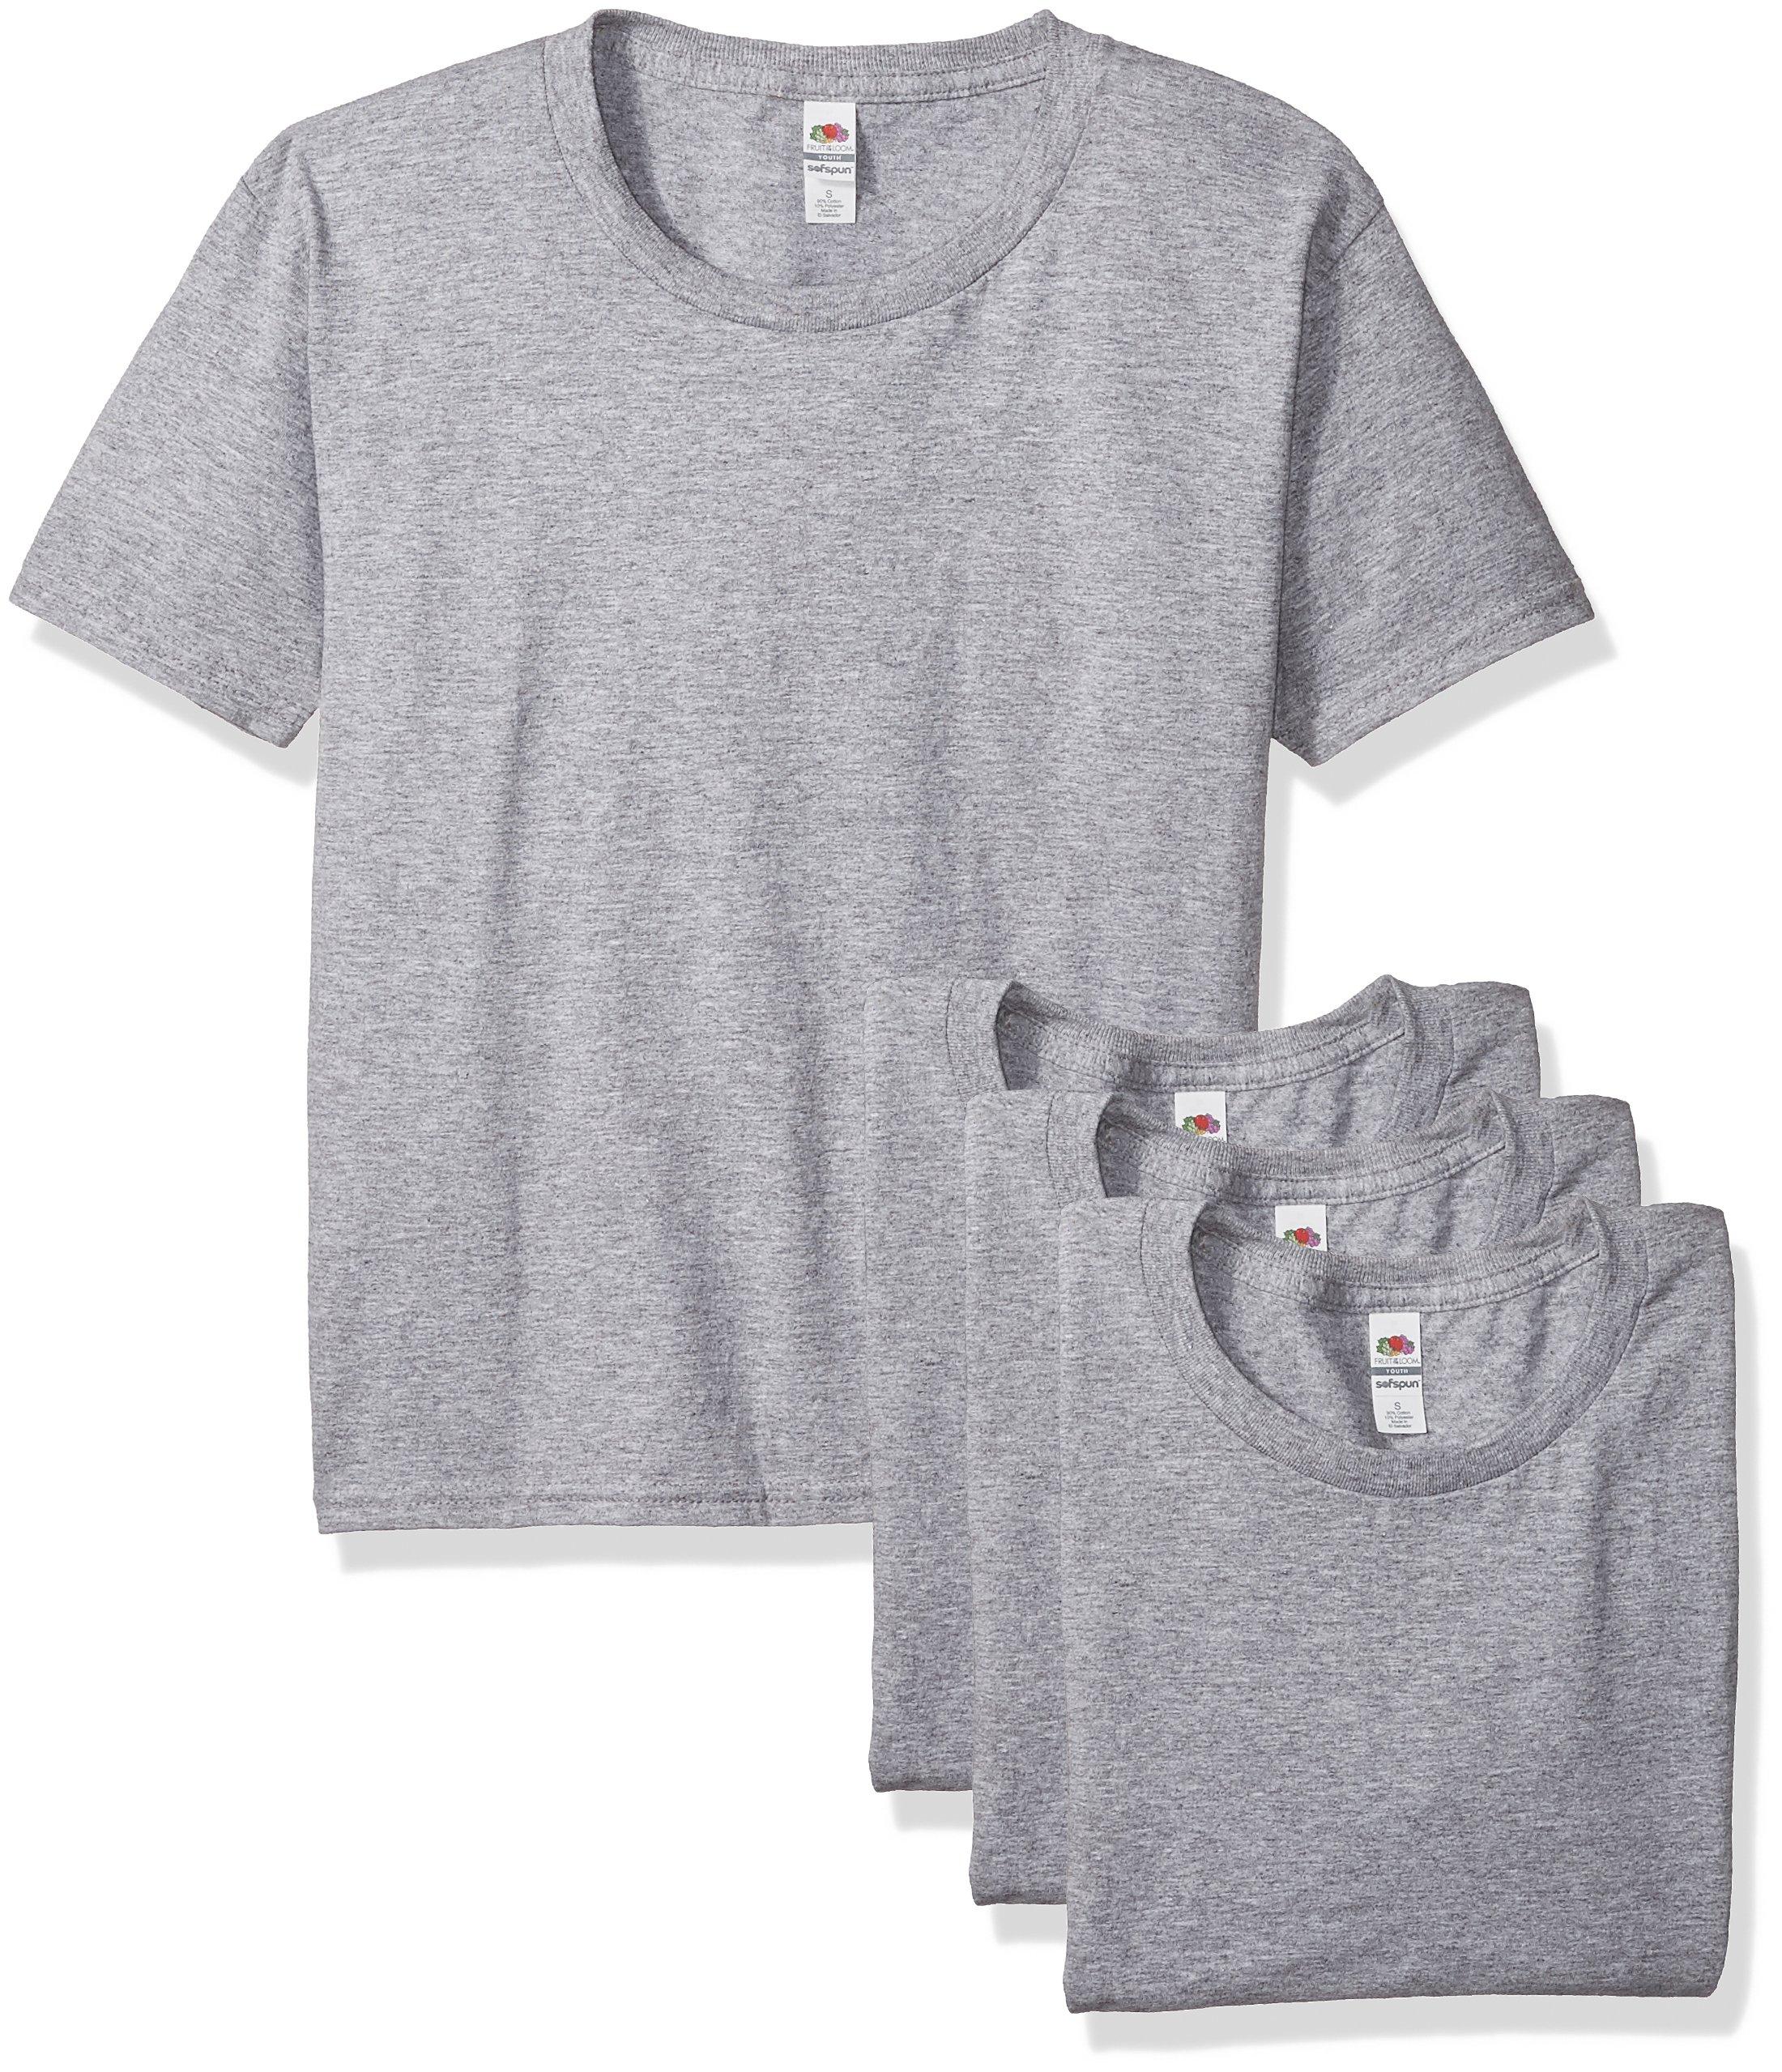 Fruit of the Loom Big Boys' Sofspun Youth T-Shirt (3-Pack)